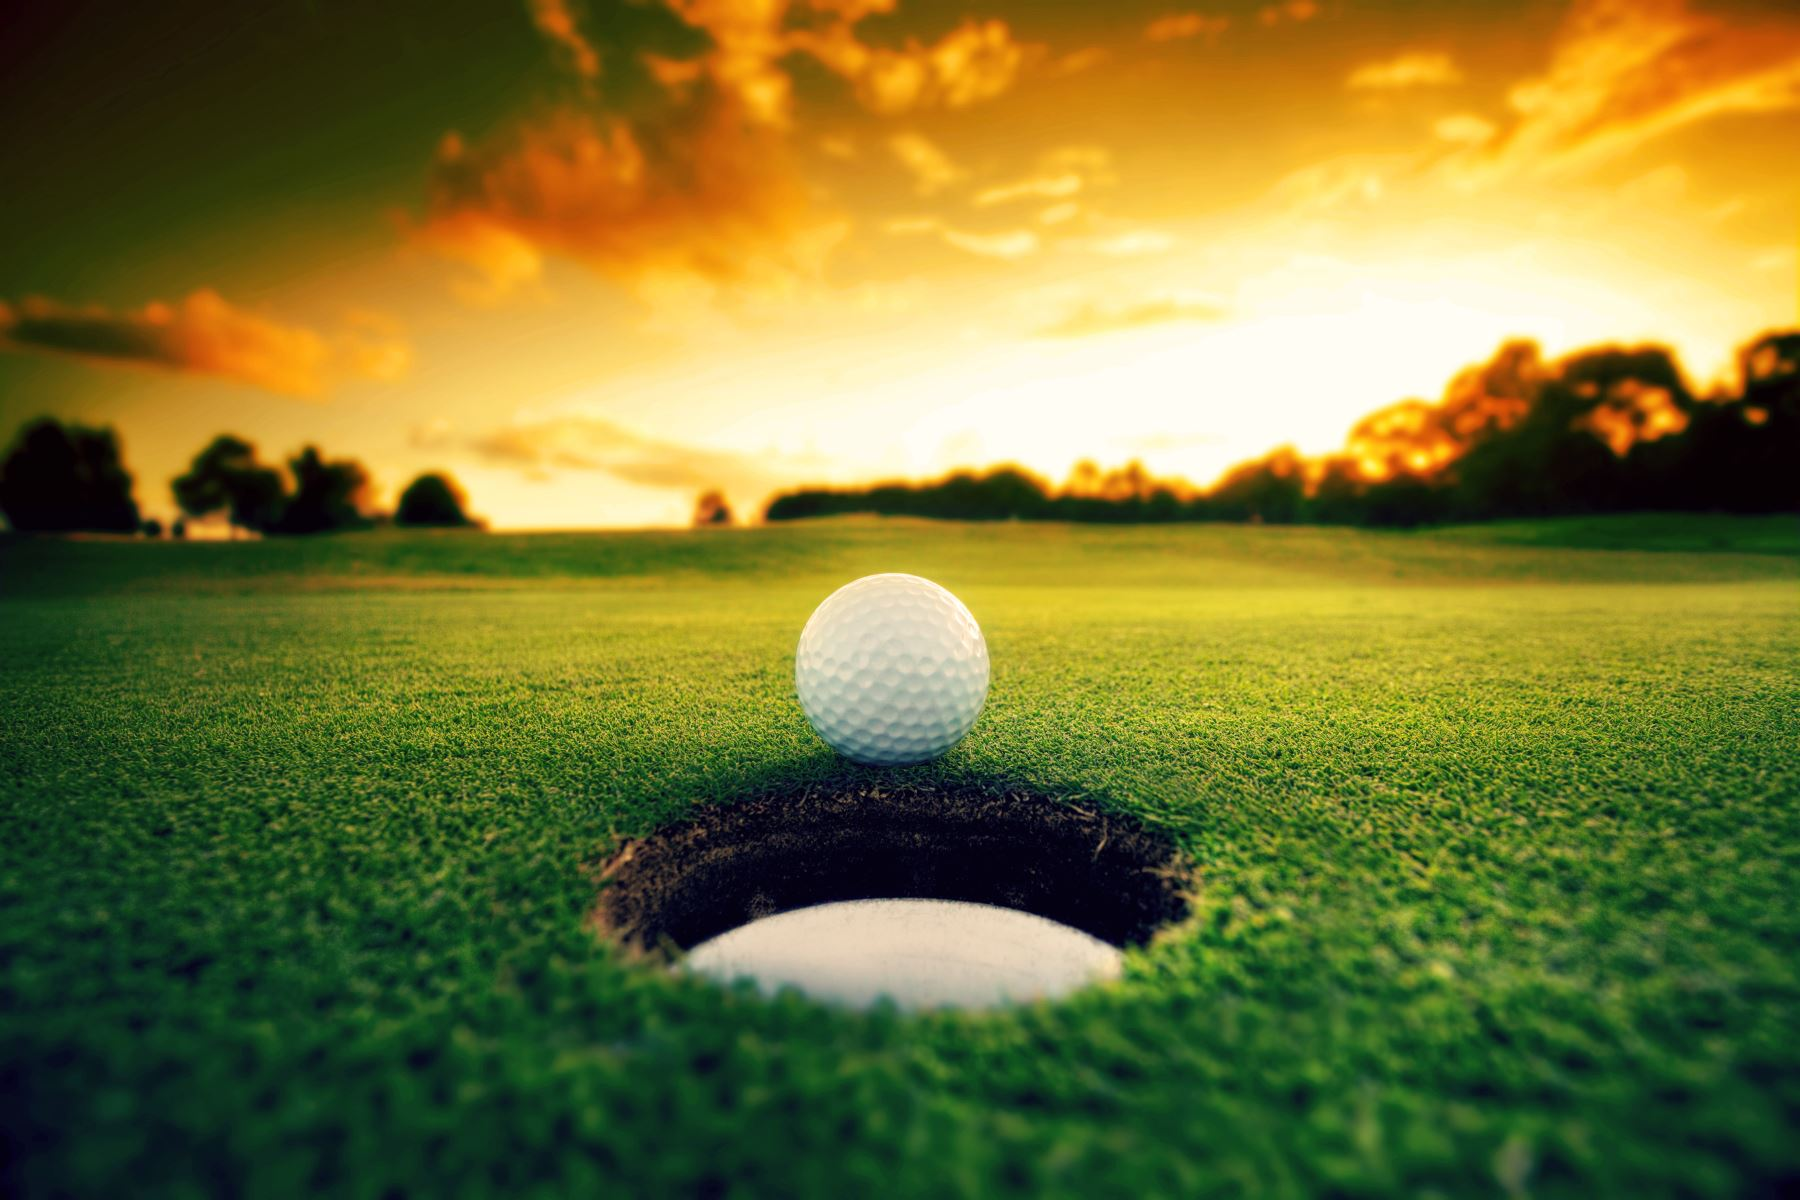 Golf Ball Near Cup